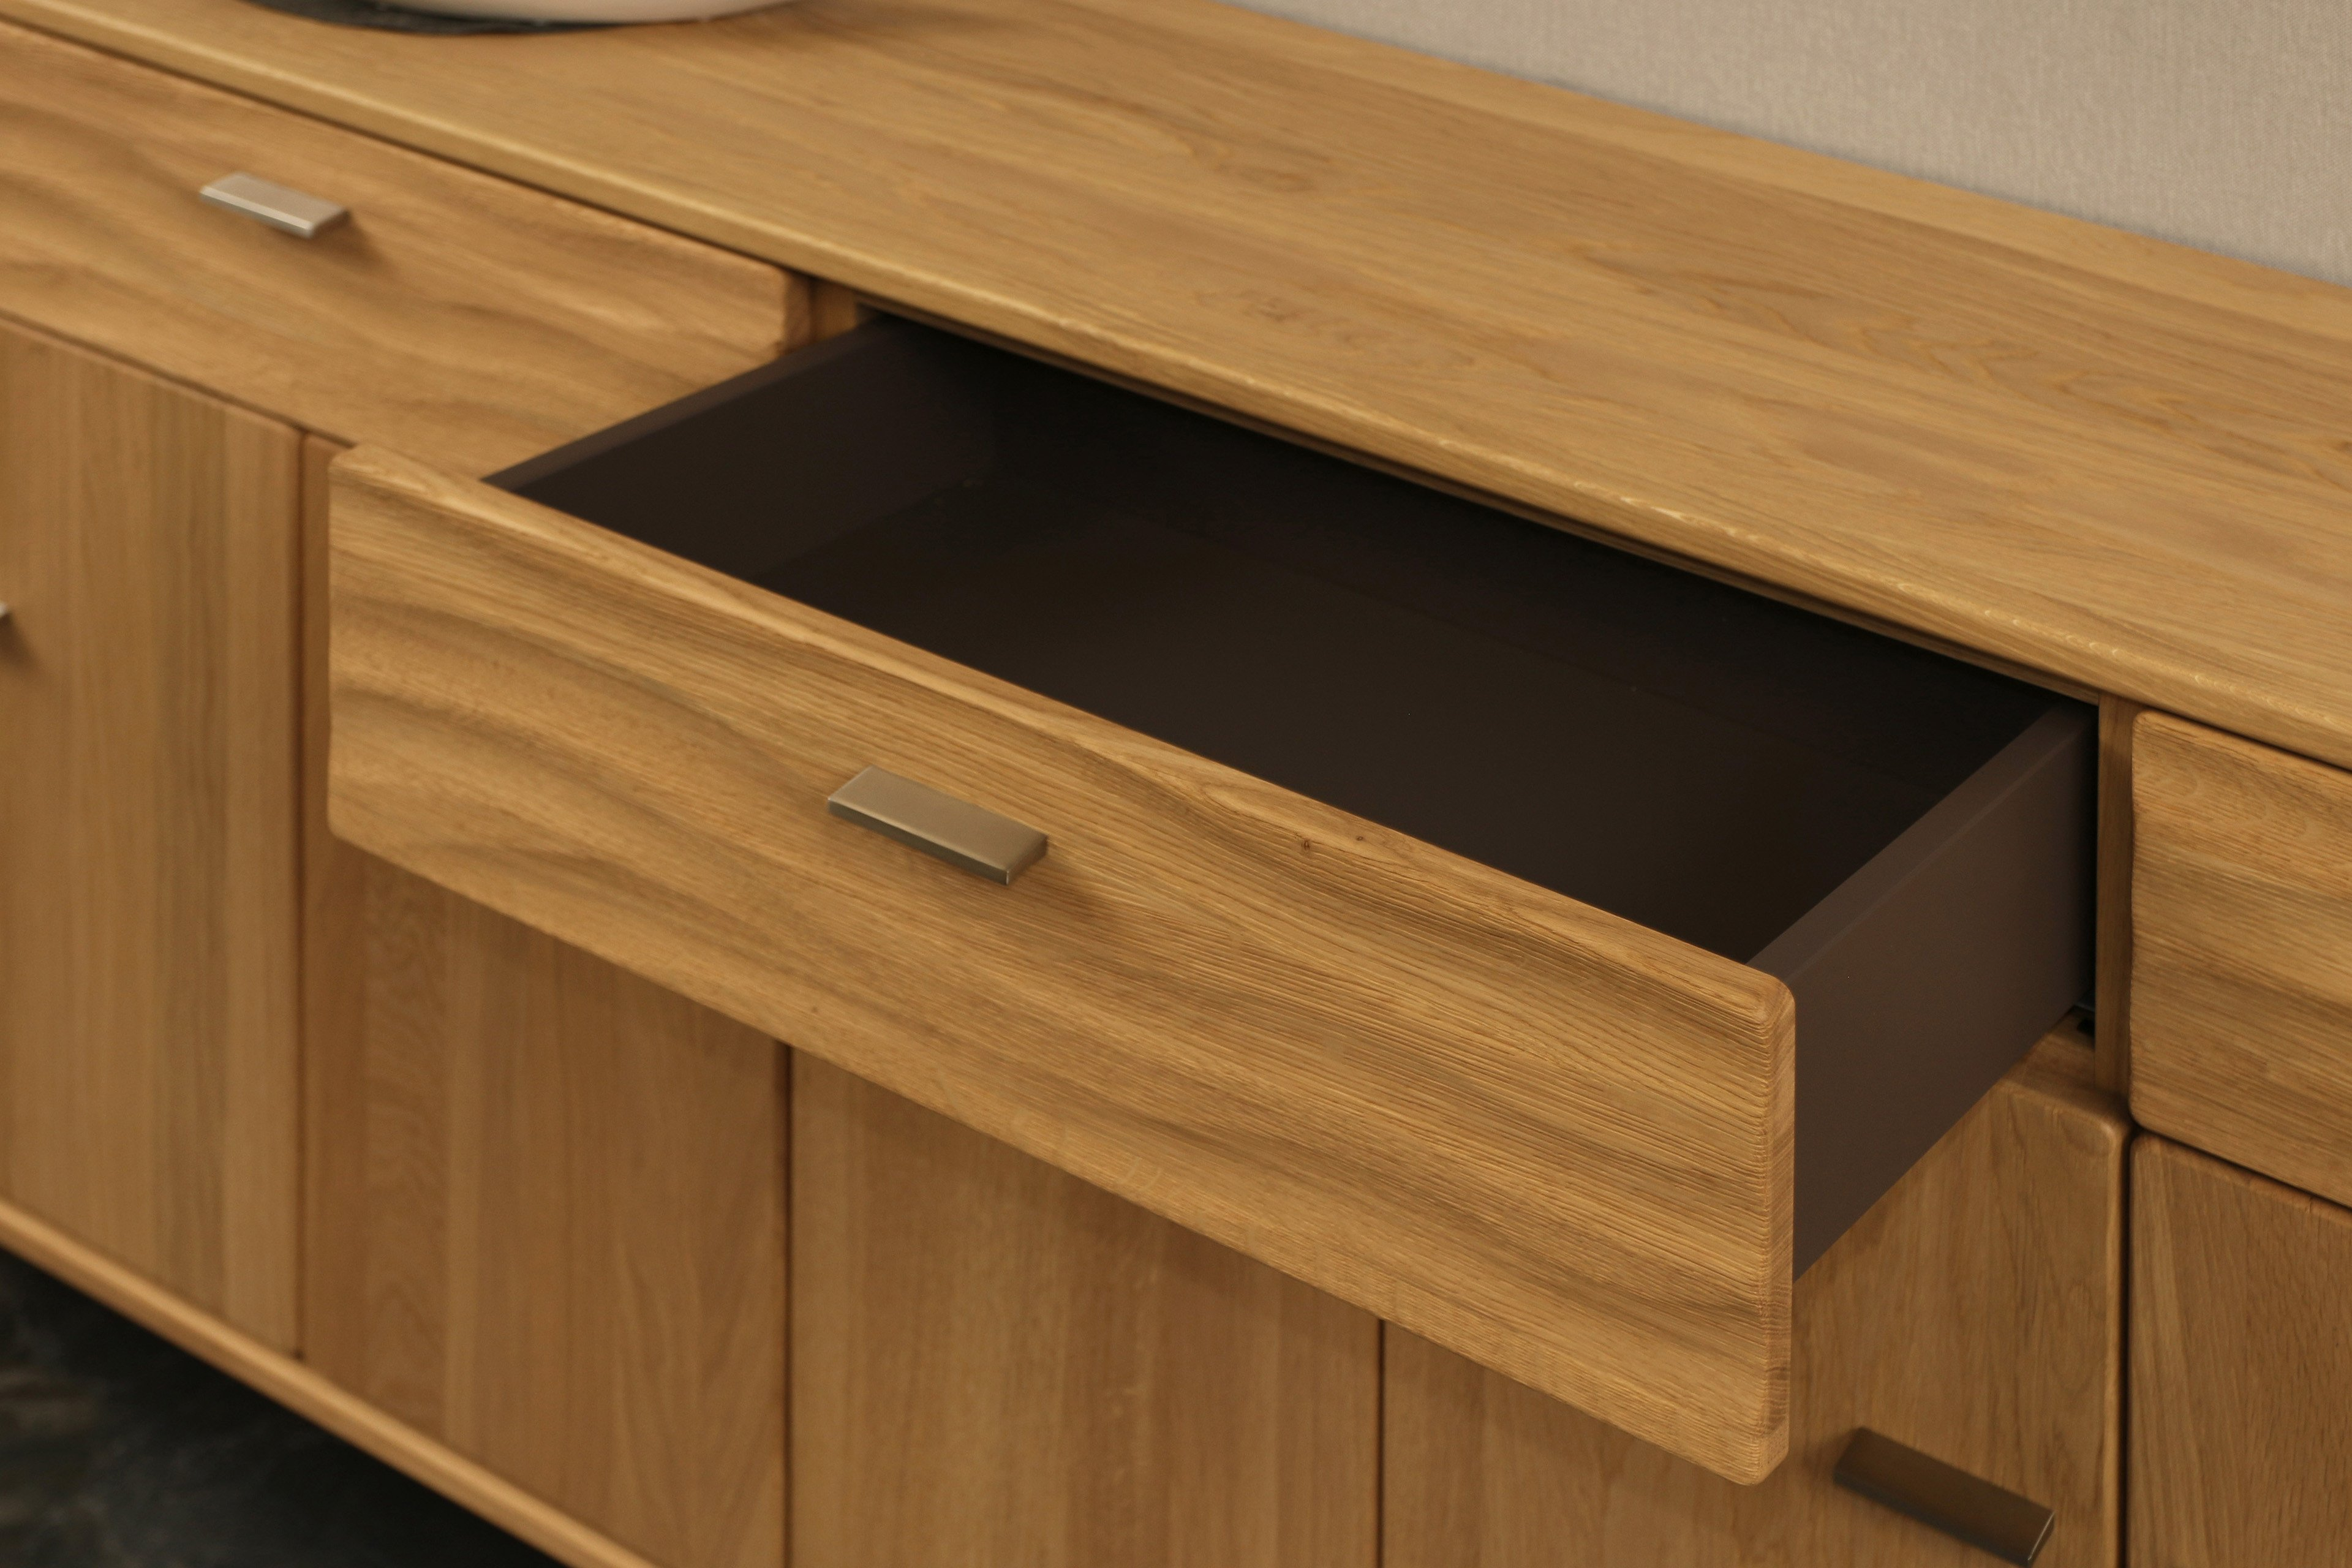 rietberger m belwerke sideboard lyon mit regal beleuchtung m bel letz ihr online shop. Black Bedroom Furniture Sets. Home Design Ideas